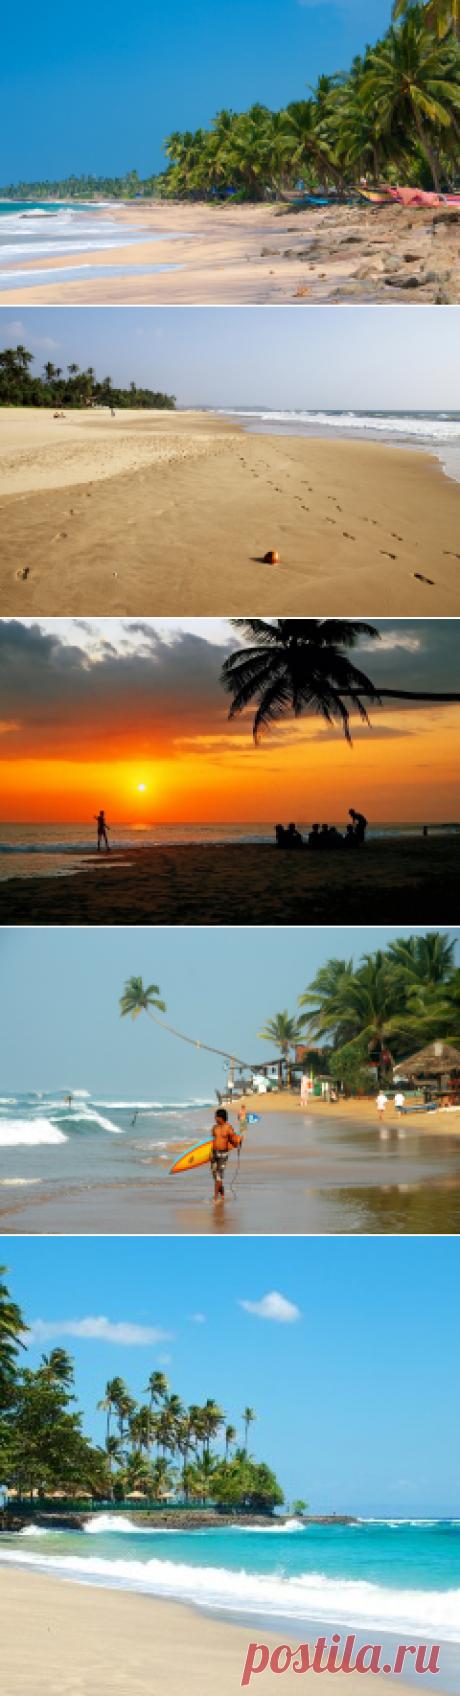 La playa Hikkaduva Bich, la Sri Lanka